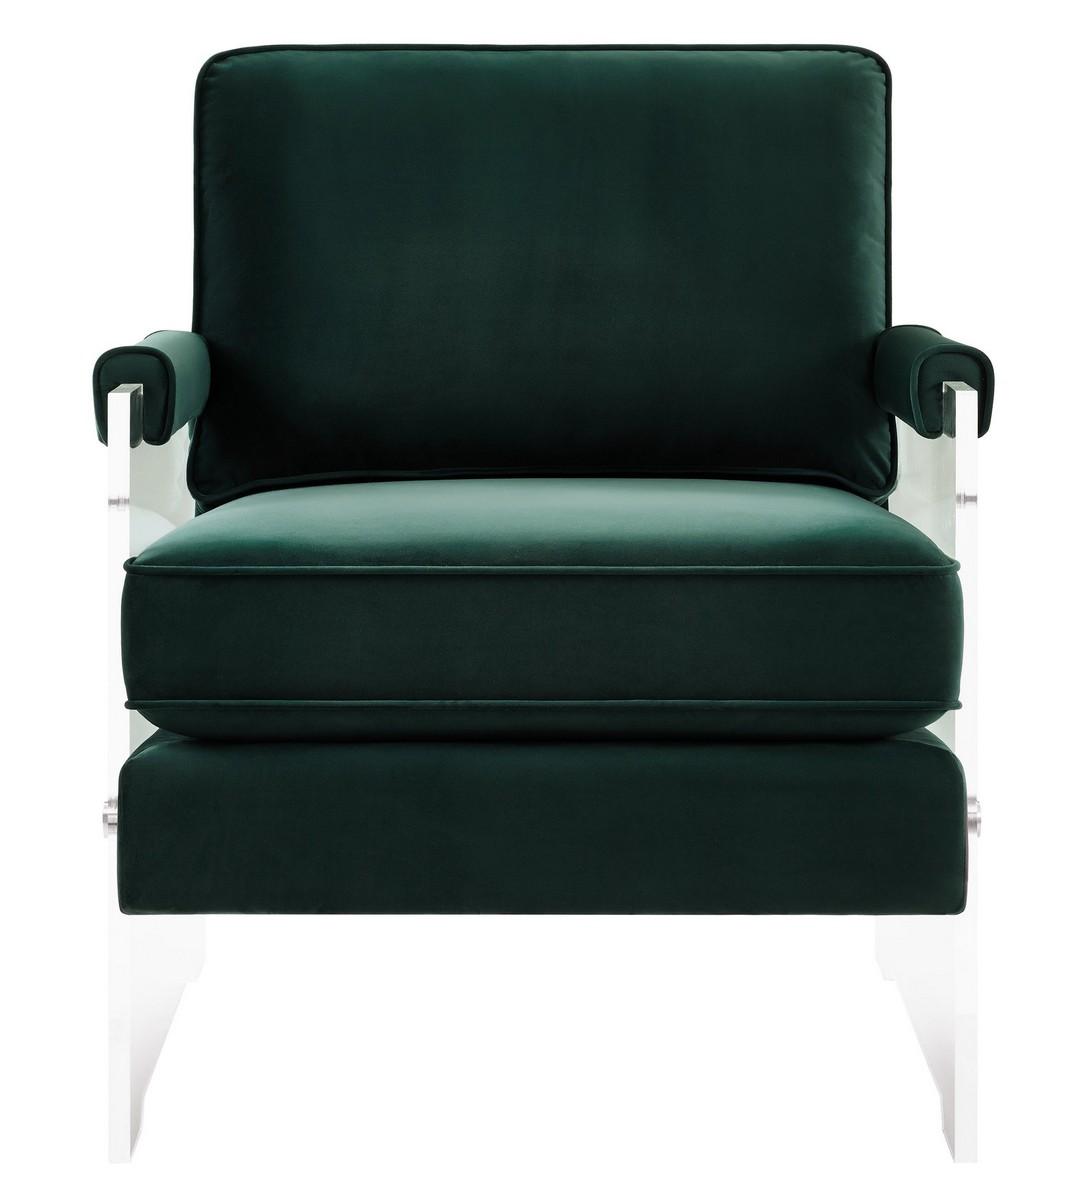 TOV Furniture Serena Green Velvet/Lucite Chair